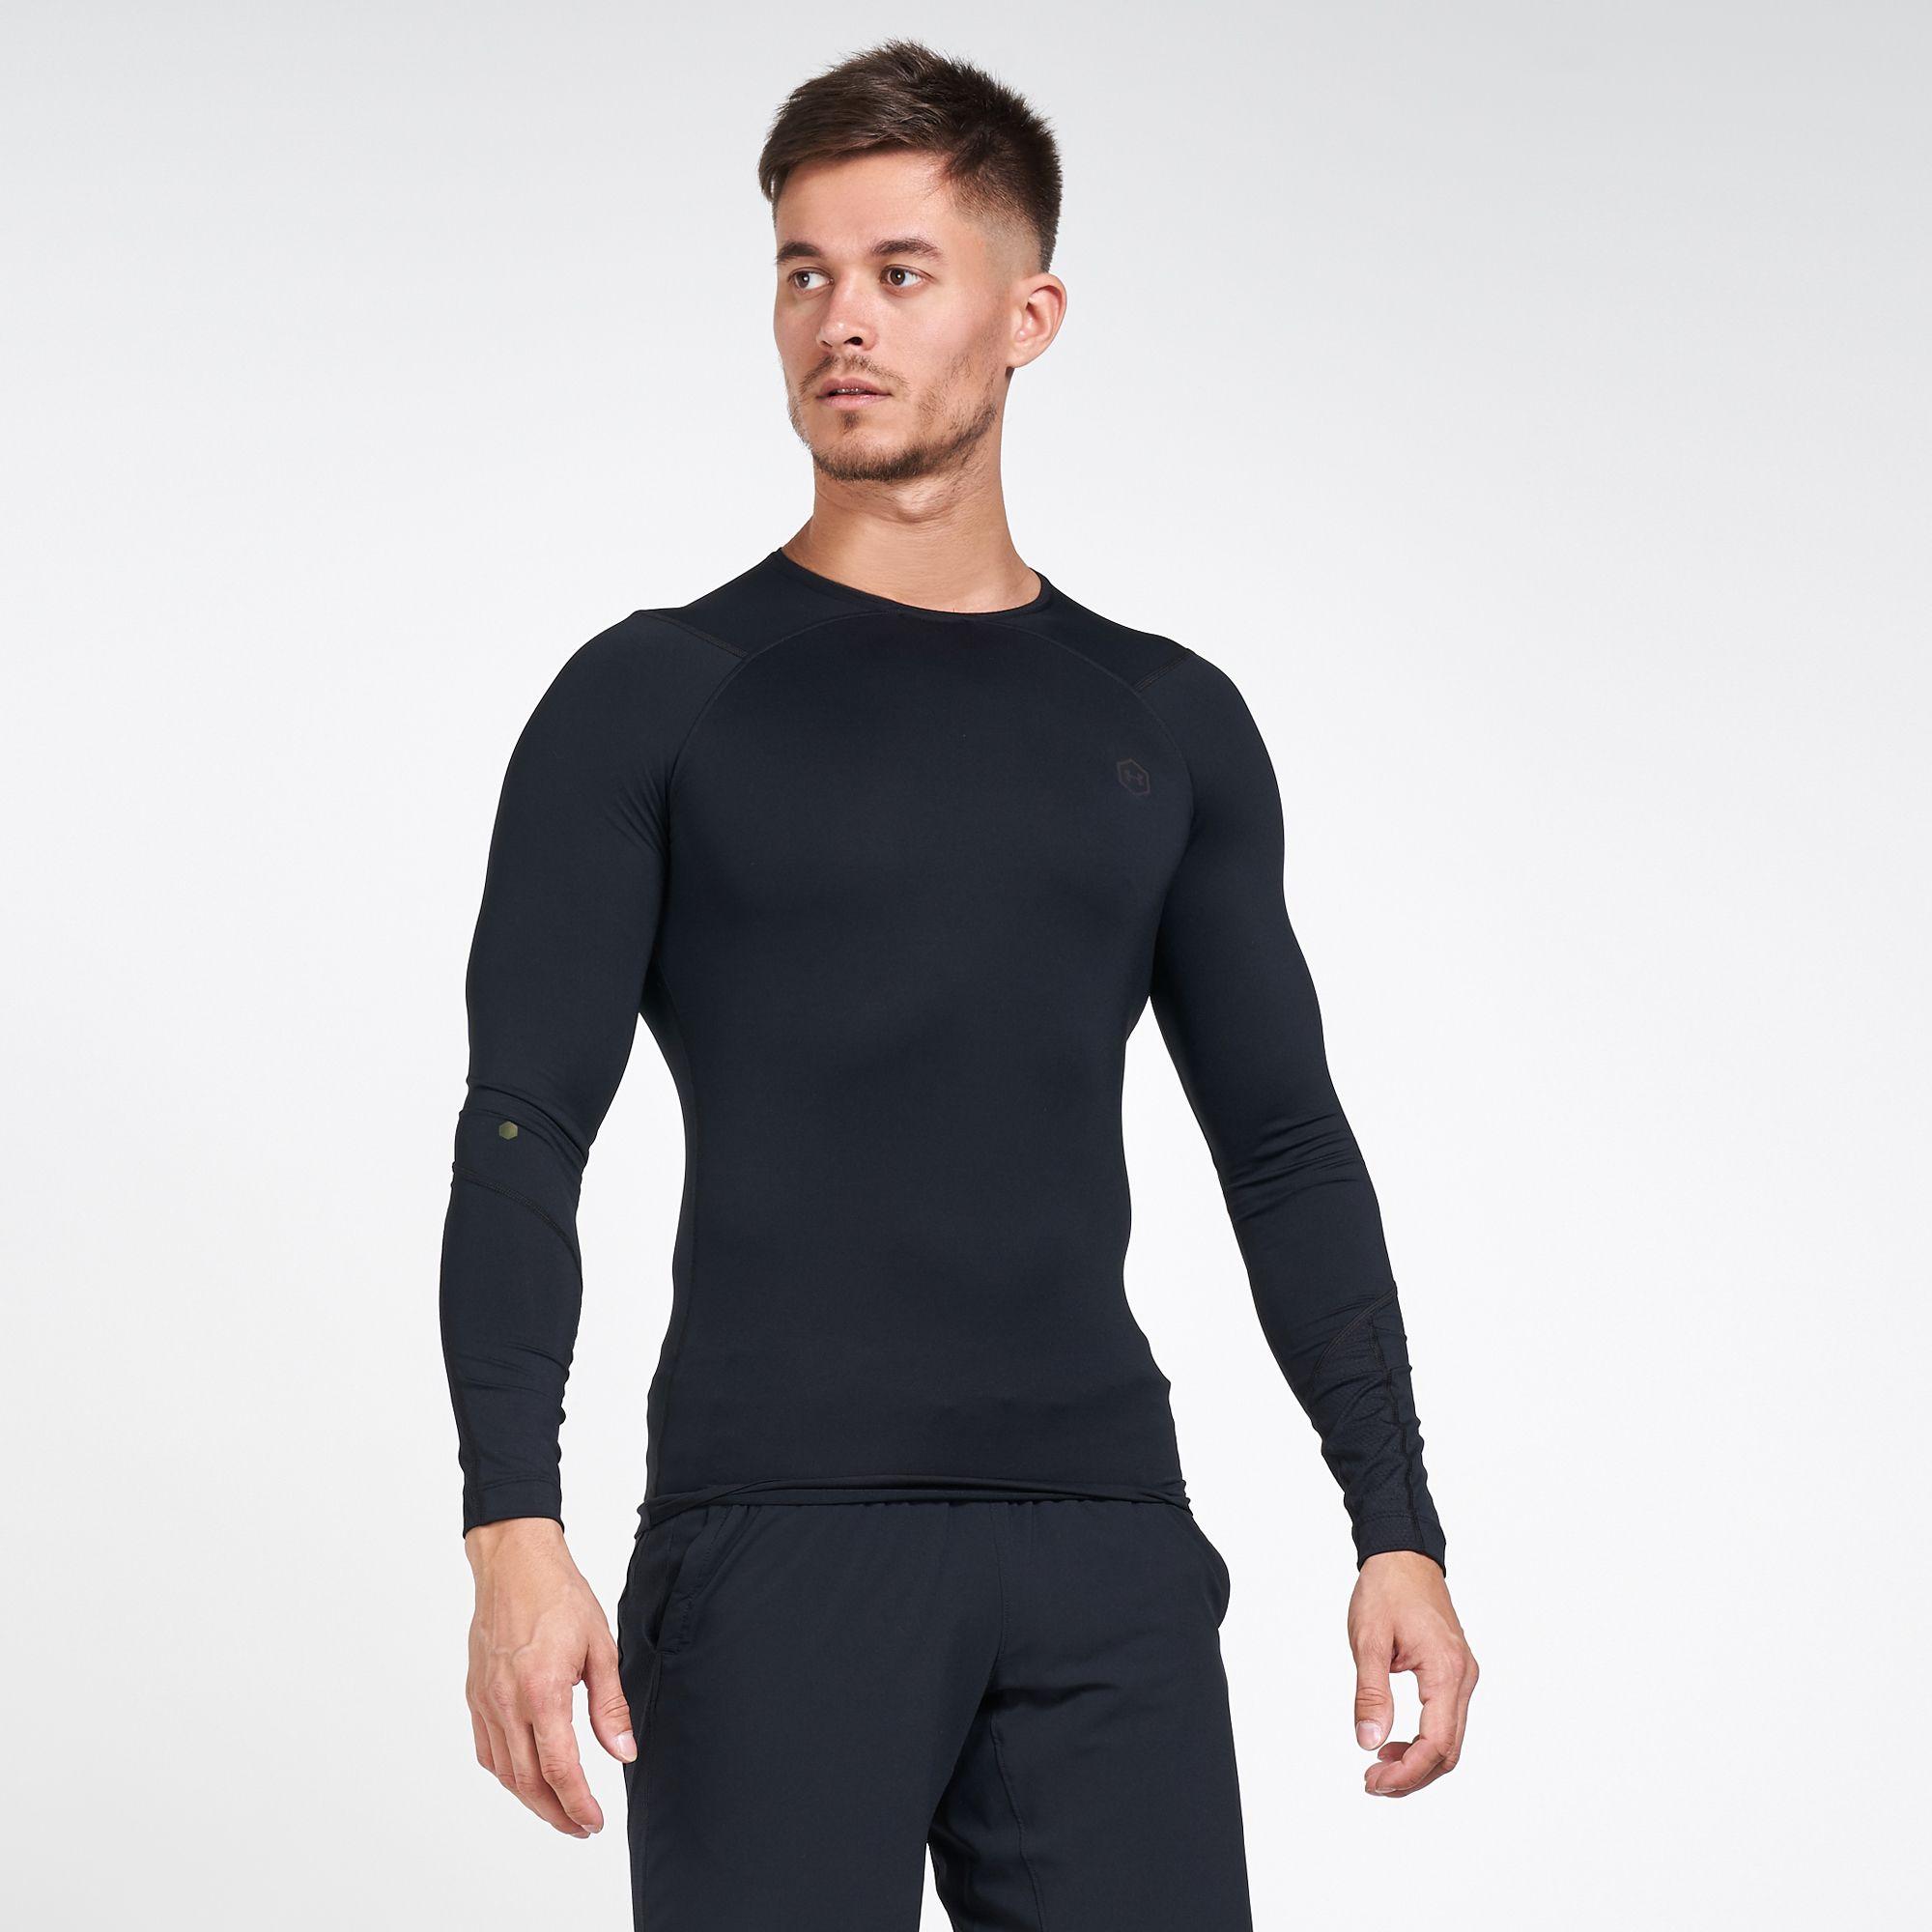 Under Armour Men's RUSH™ HeatGear® Compression Long Sleeves T-Shirt